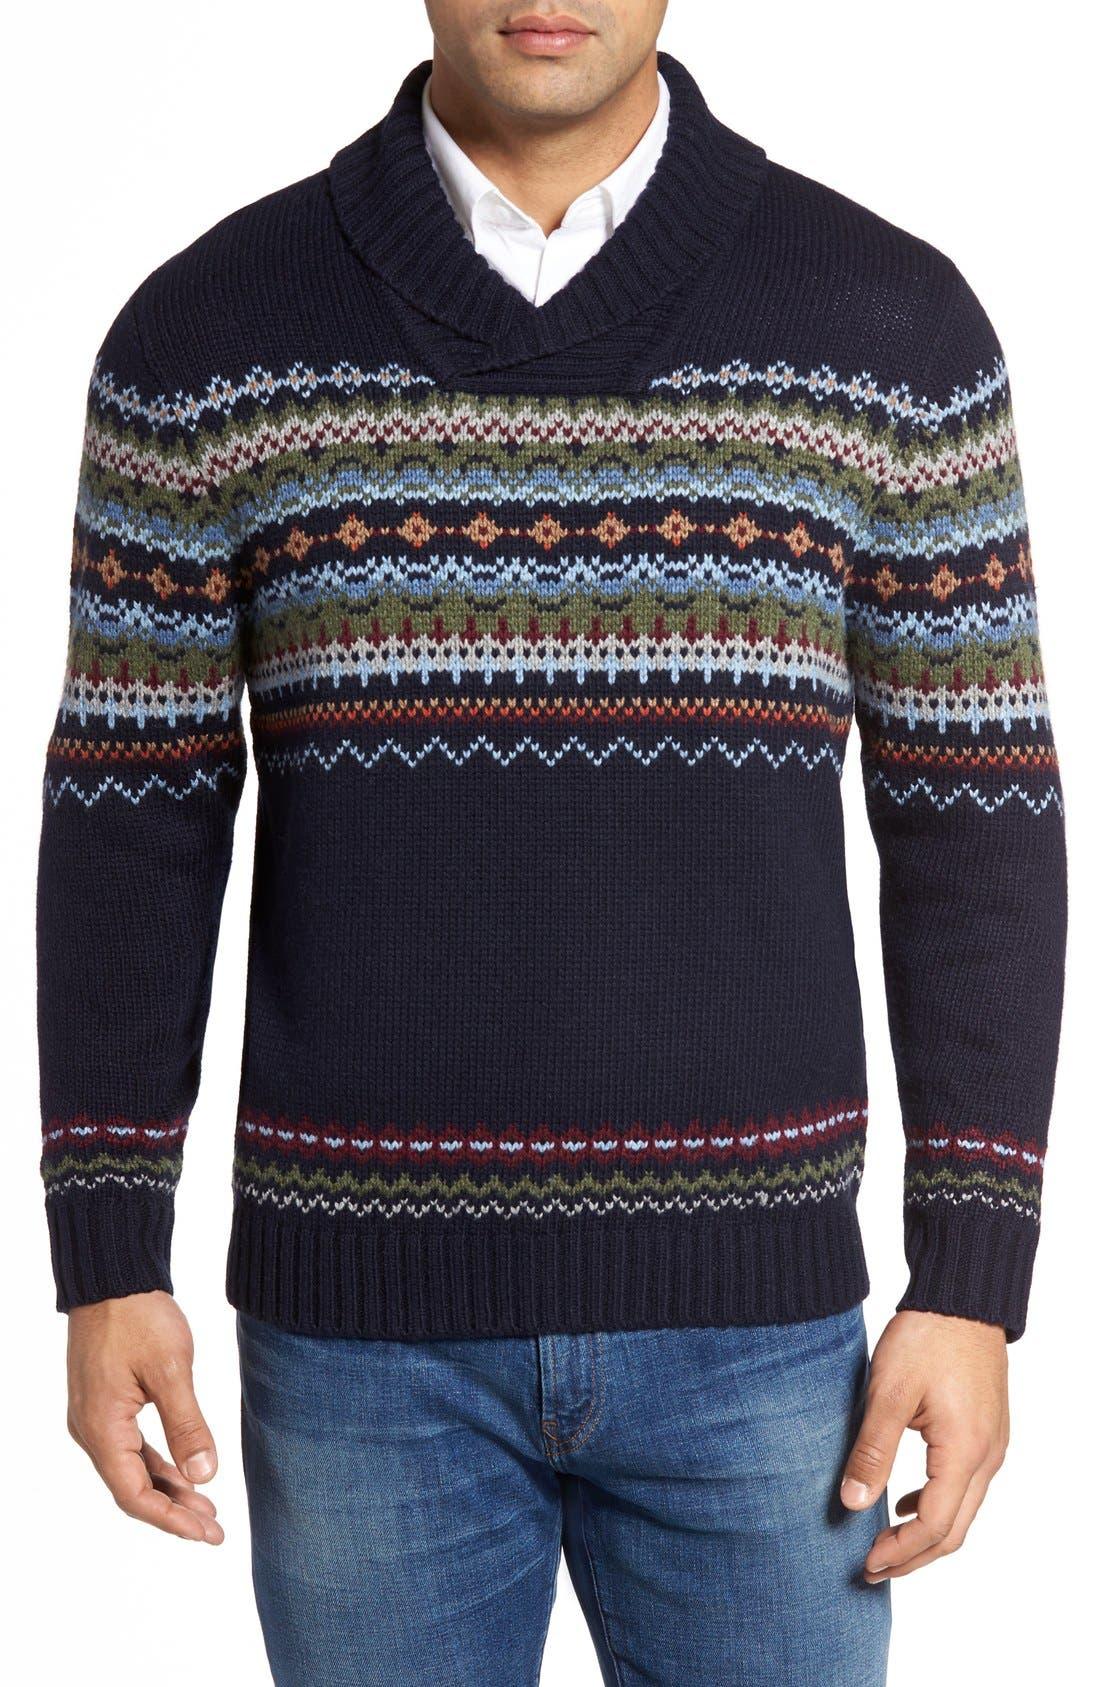 Tommy Bahama Fair Isle Sweater